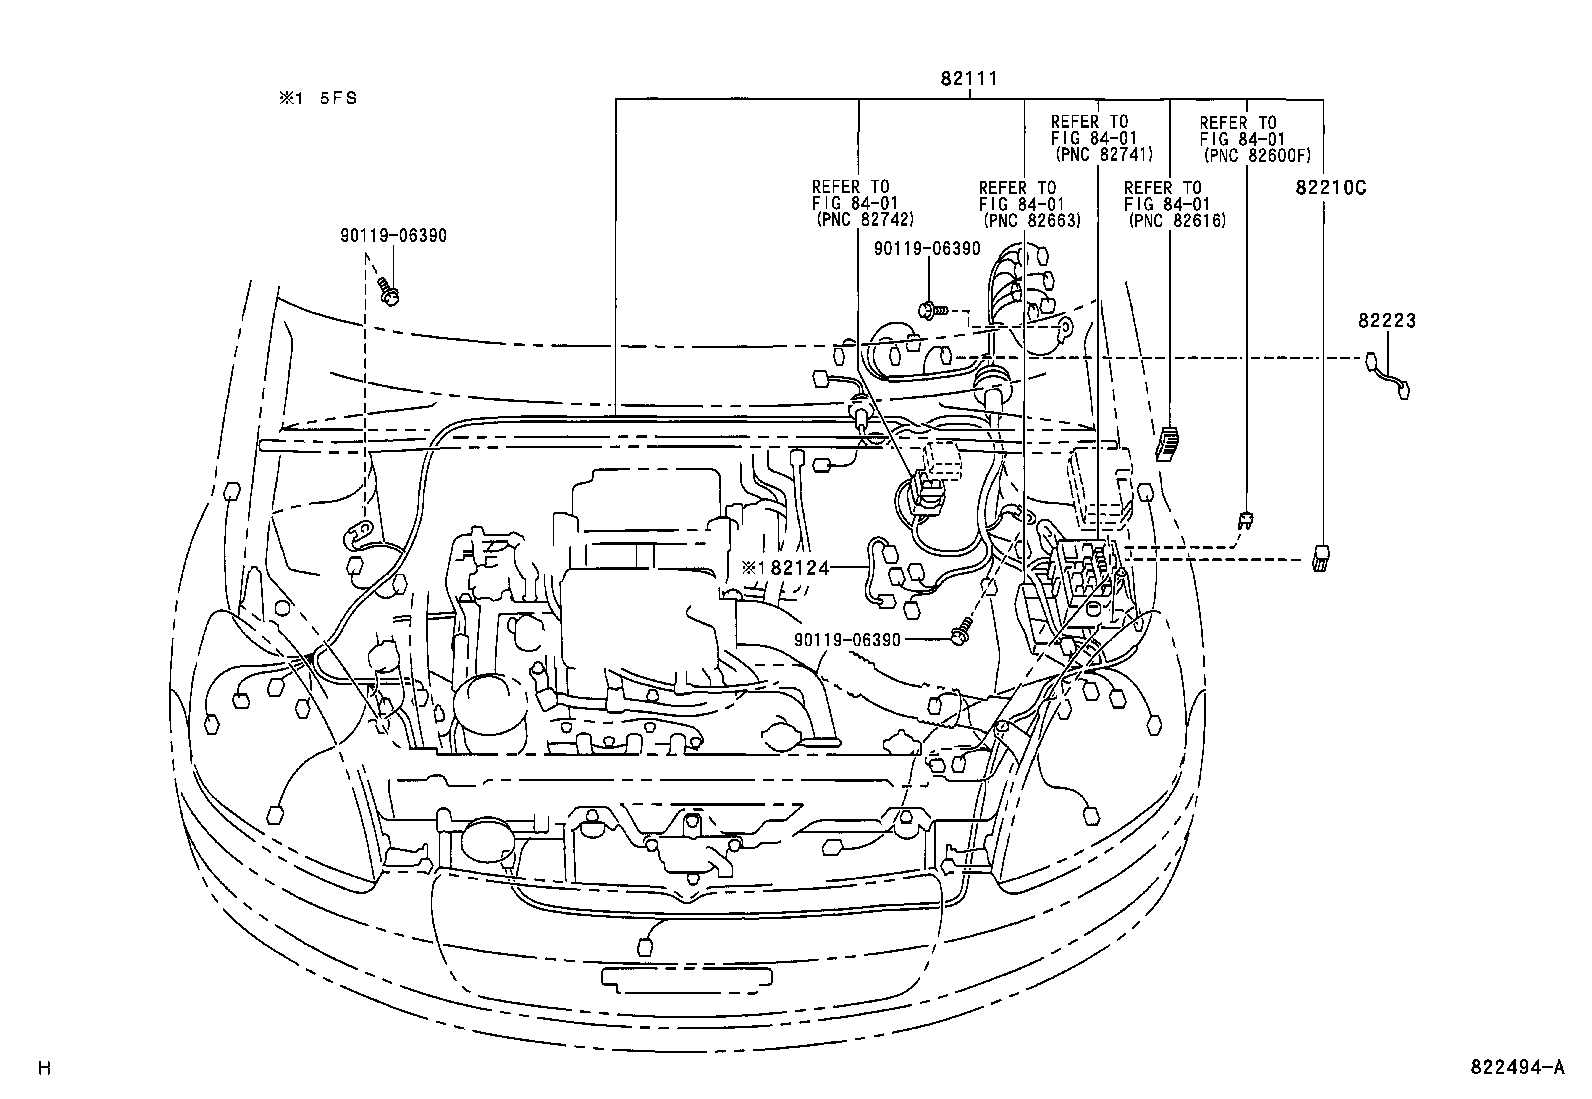 2007 Toyota Yaris Engine Diagram - 2007 Nissan Versa Fuse Box Underhood -  loader.tukune.jeanjaures37.fr | 2007 Toyota Yaris Engine Diagram |  | Wiring Diagram Resource